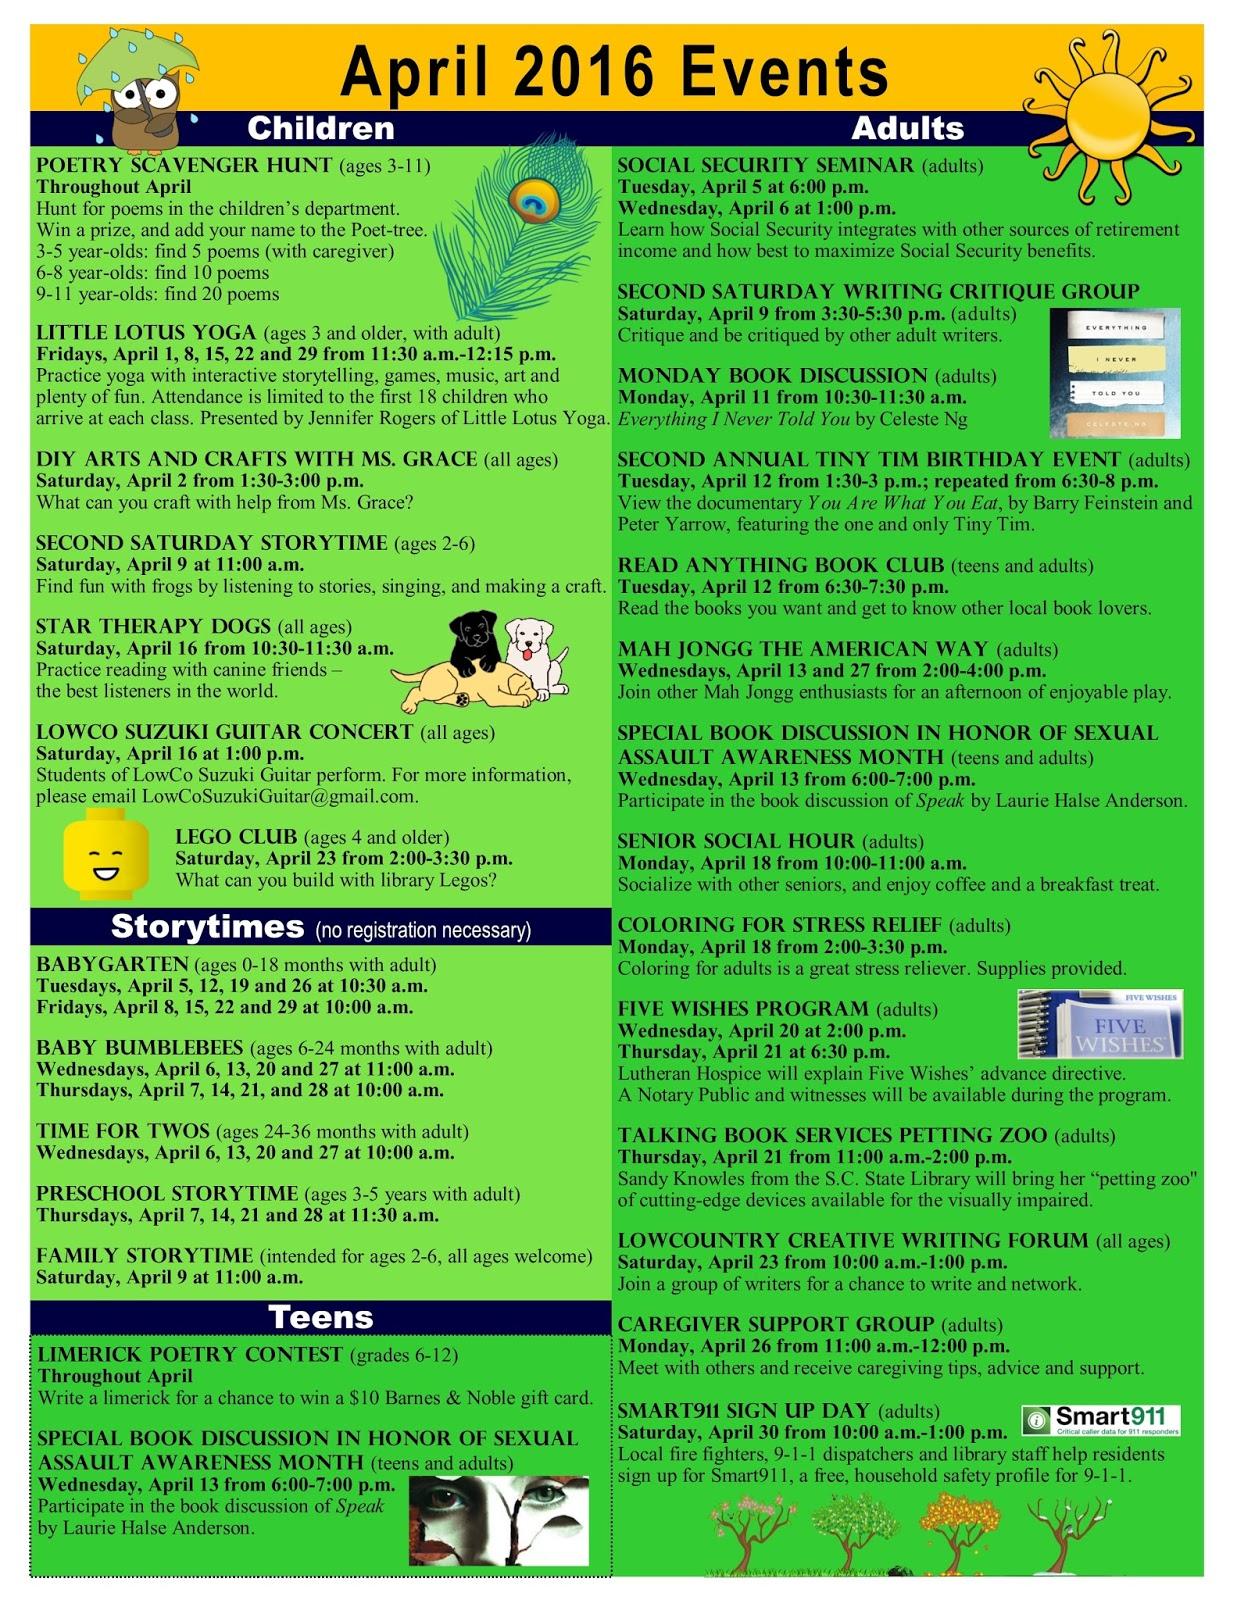 aramco operational calendar 2014 auto electrical wiring diagram rh wiring diagram edu fr keldean co uk [ 1237 x 1600 Pixel ]